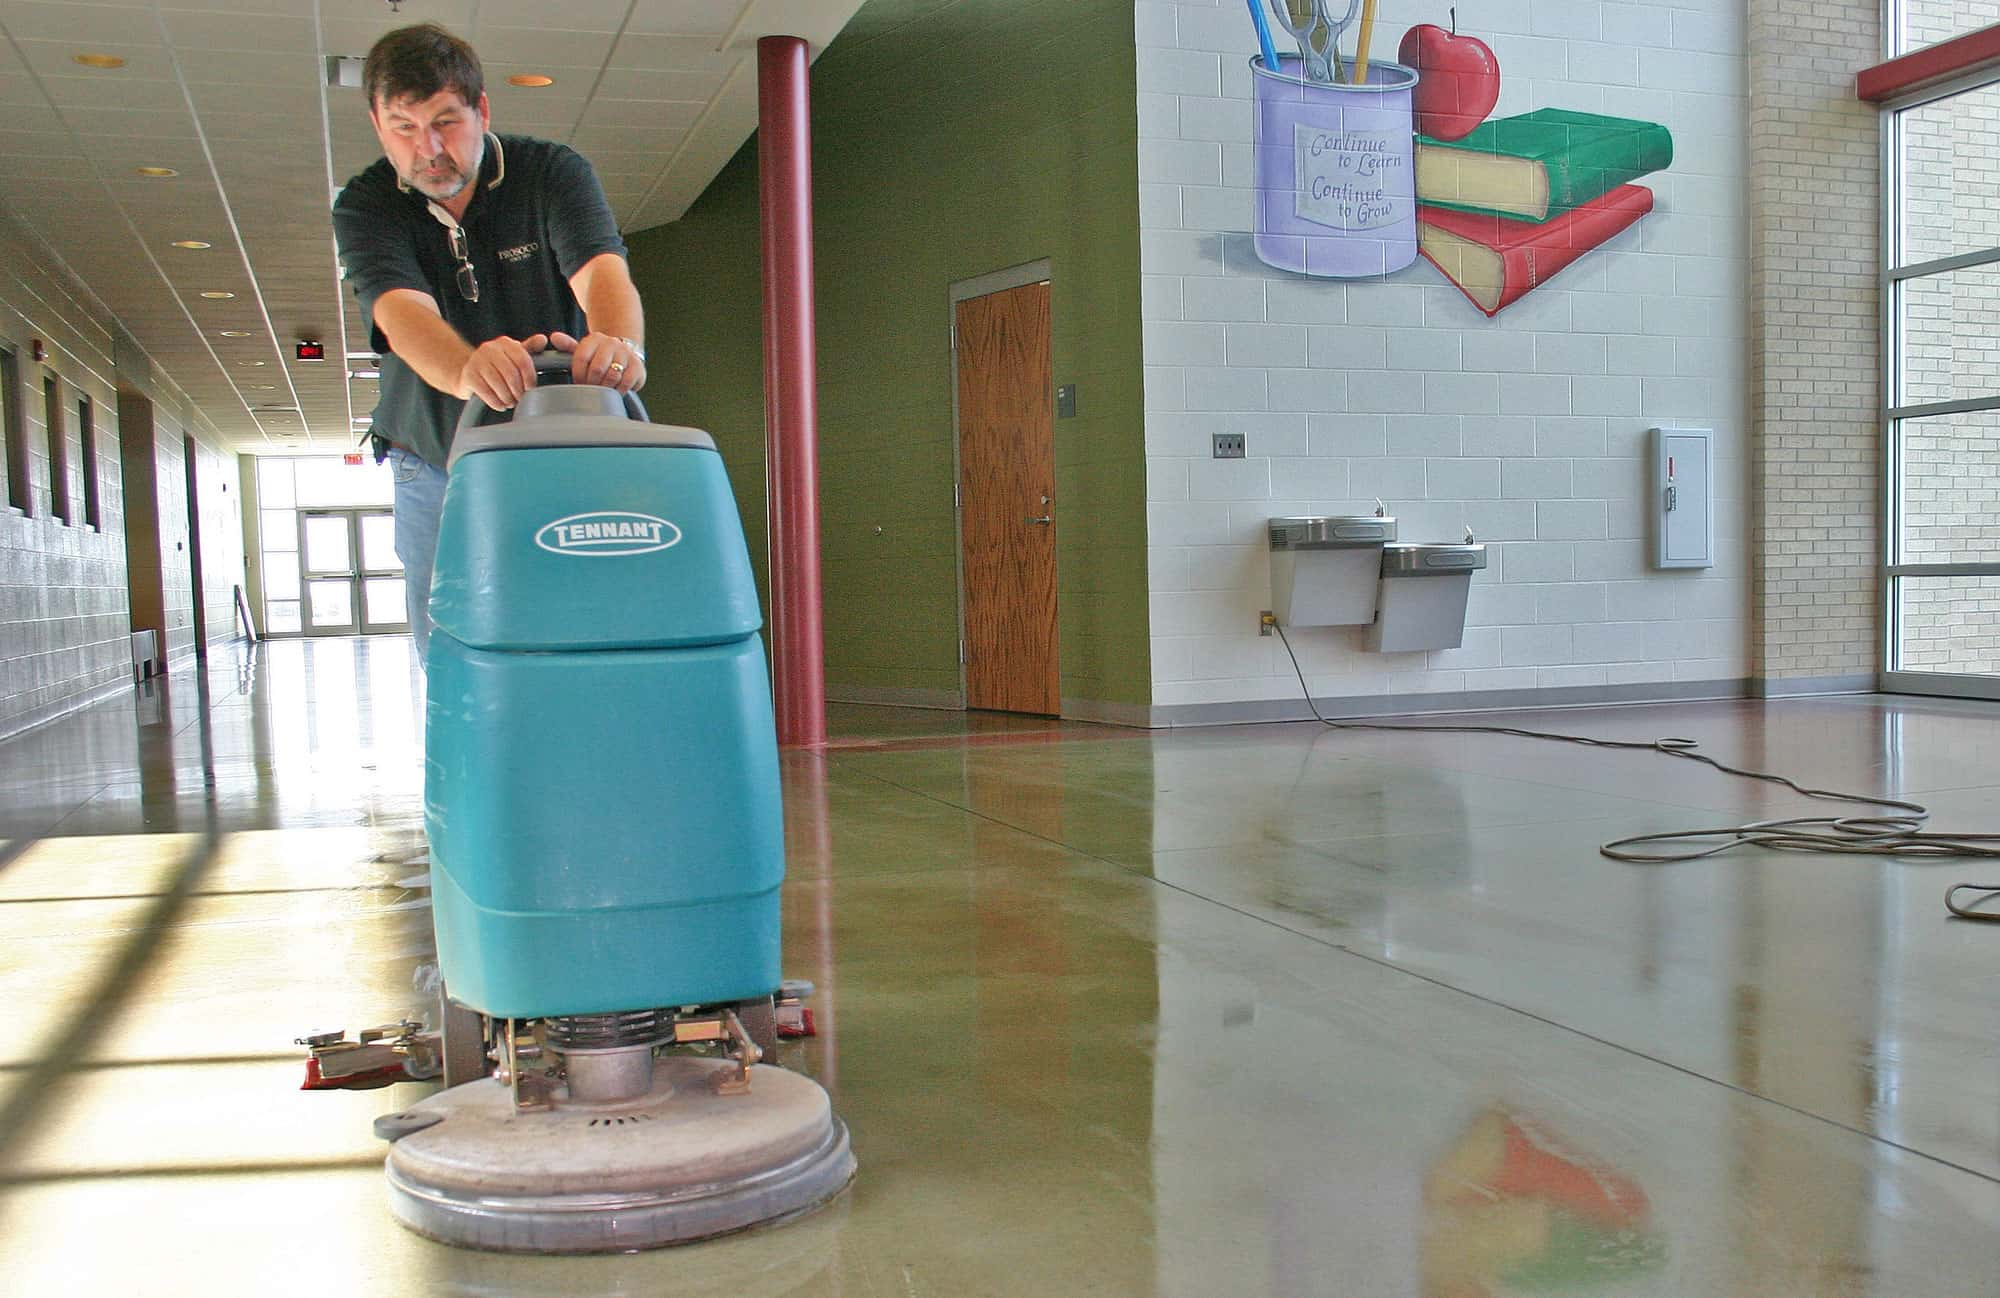 Autoscrubber on a concrete floor